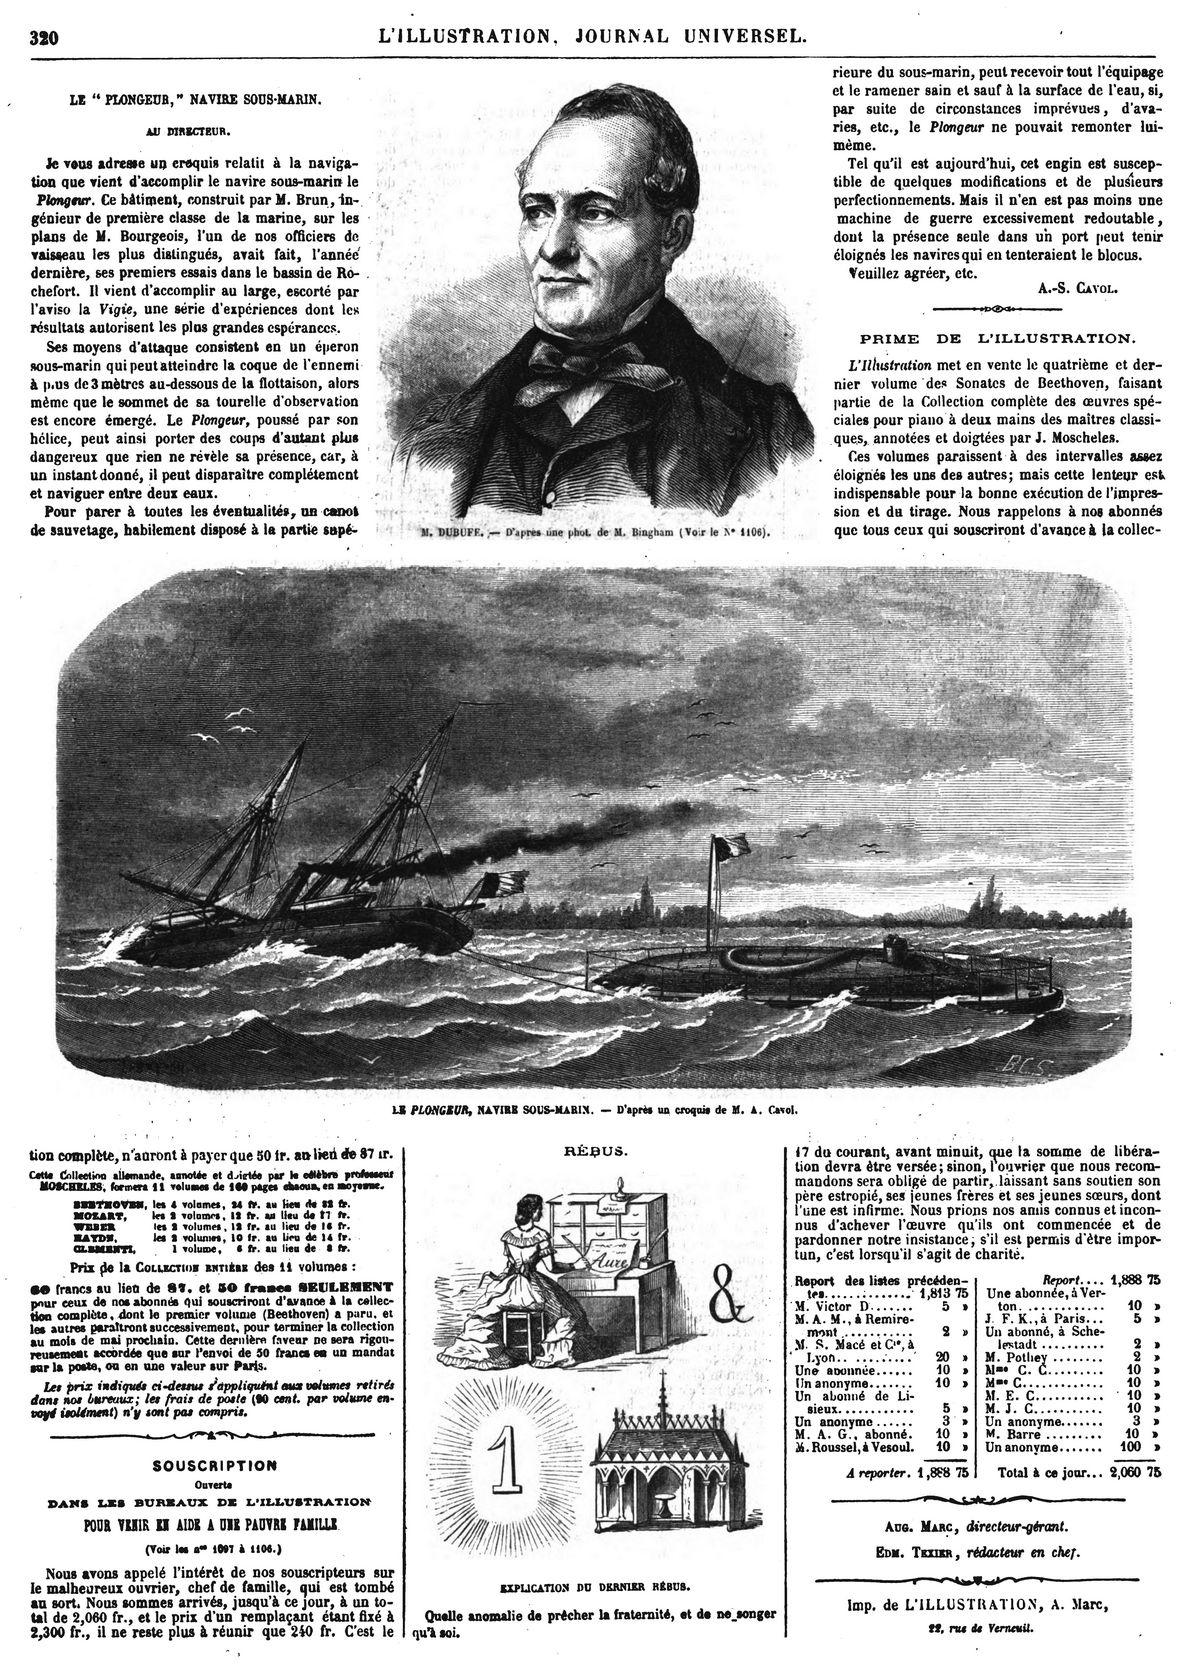 M. Dubufe. Le Plongeur, navire sous-marin